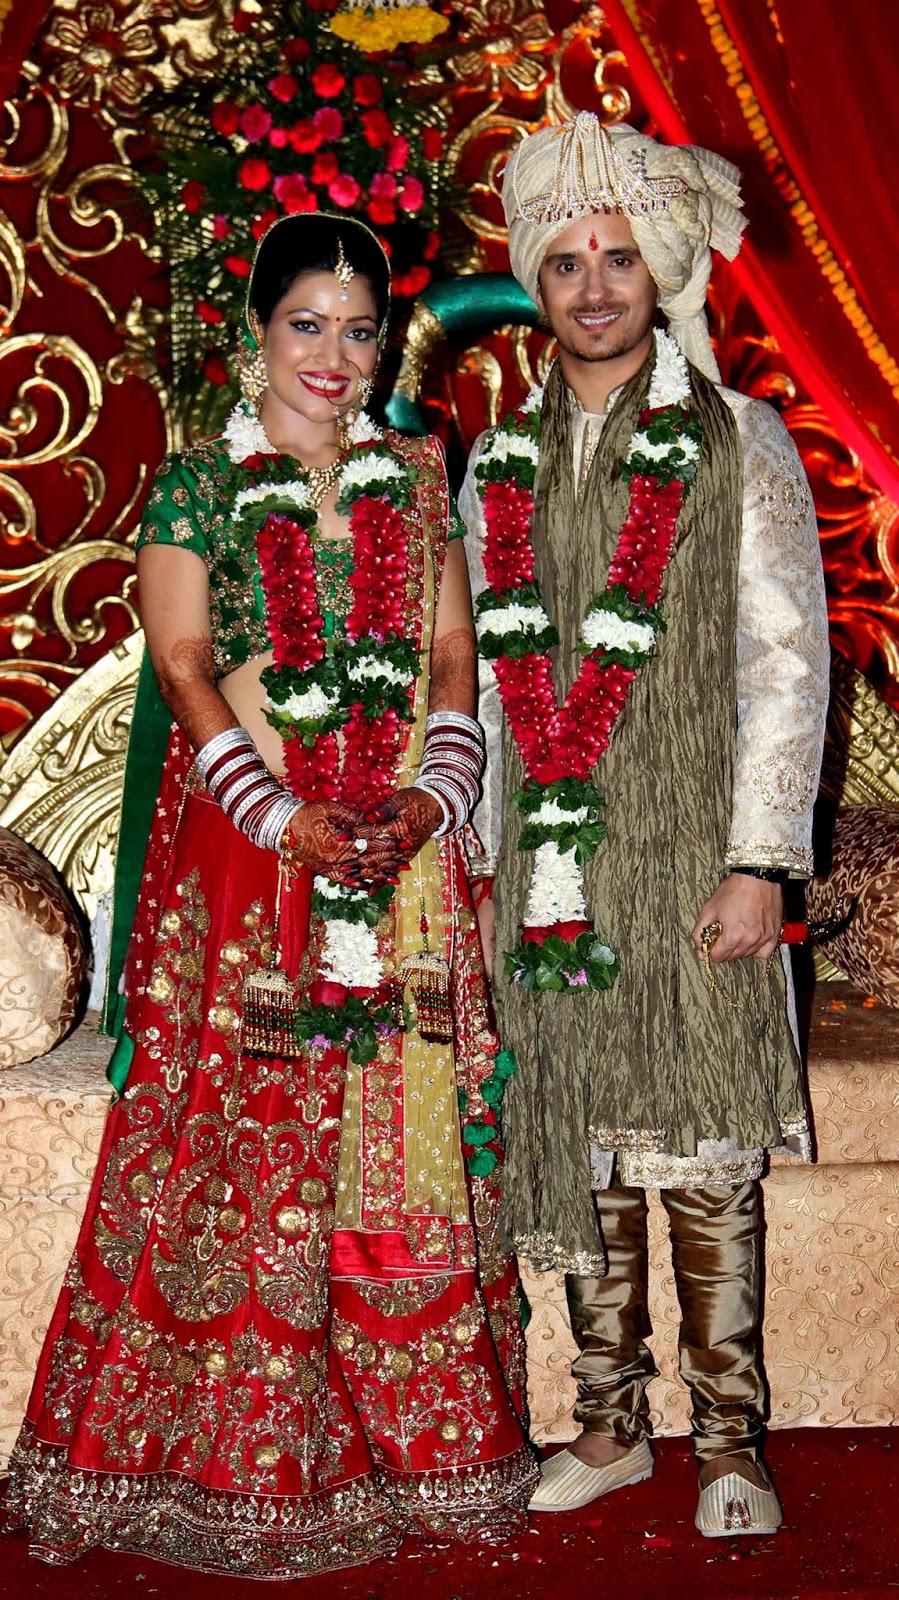 Bollywood, Showbiz, Singer, Raghav Sachar, Actress, Amita Pathak, Film, Movie, Marriage, Wedding, Lifestyle, Mumbai, India, Parents, Ceremony,